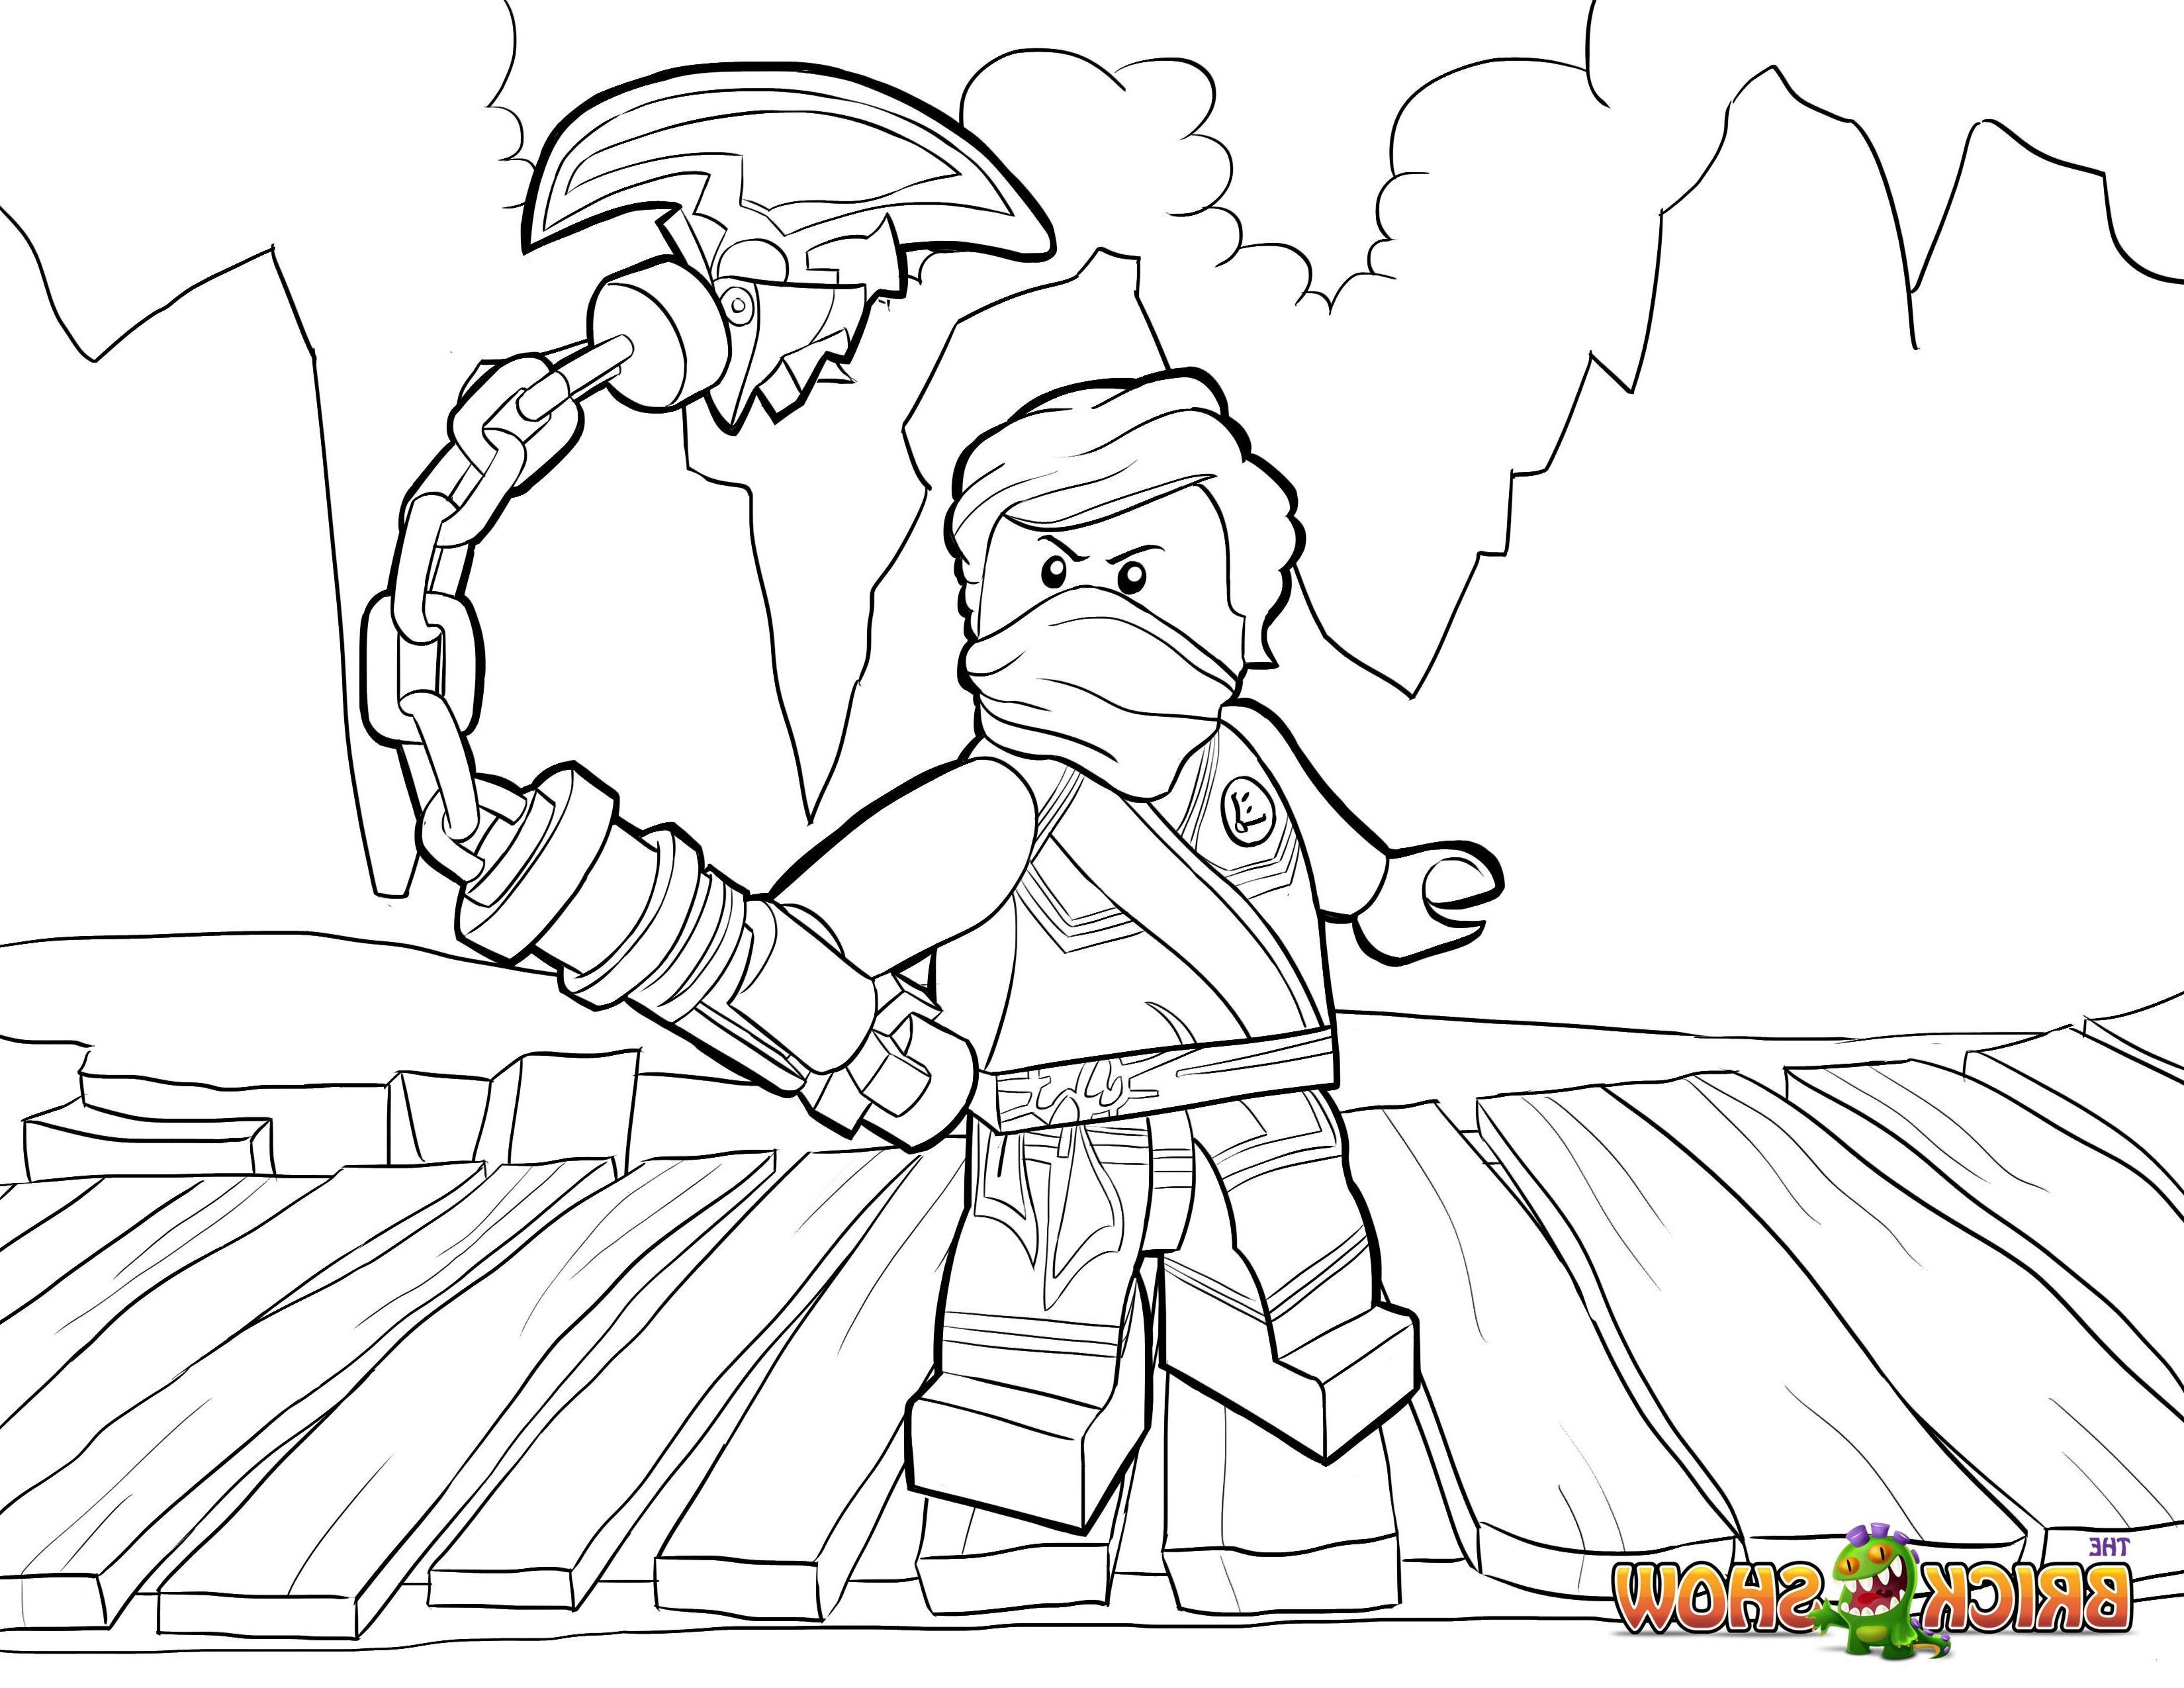 Ausmalbild Ninjago Drache Inspirierend 38 Fantastisch Ausmalbilder Ninjago Drache – Große Coloring Page Bild